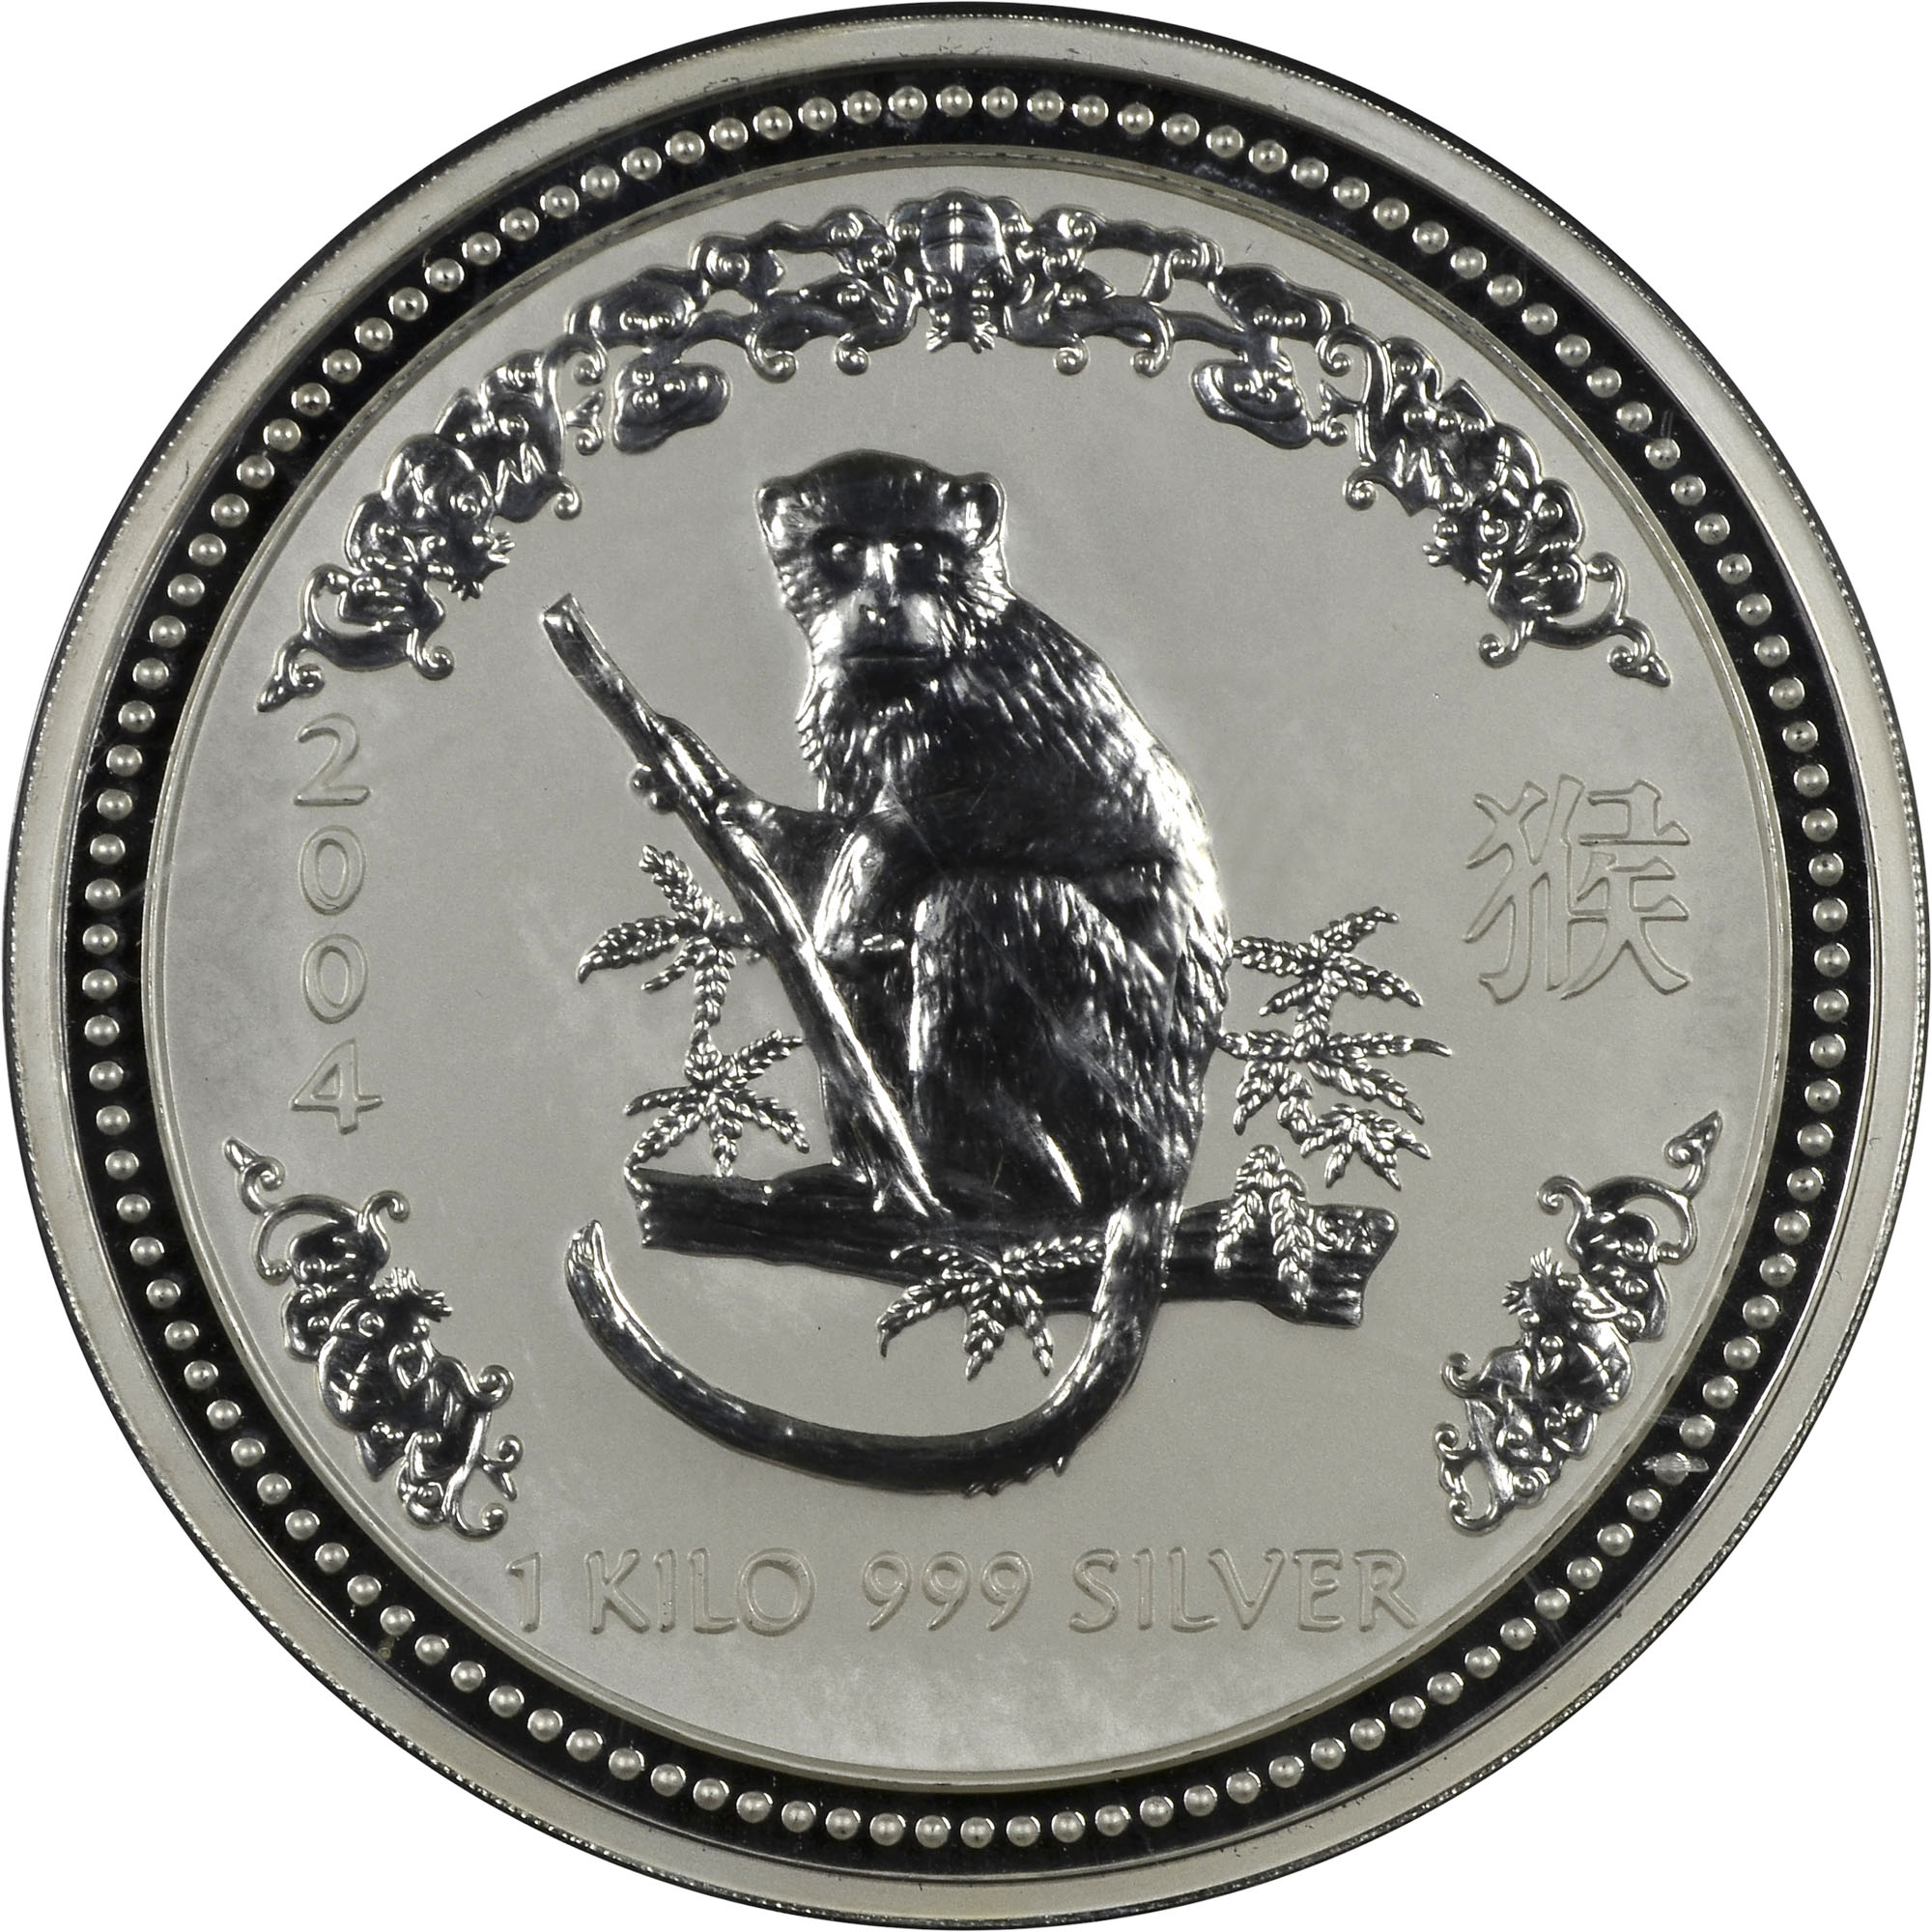 2004 Australia 30 Dollars reverse